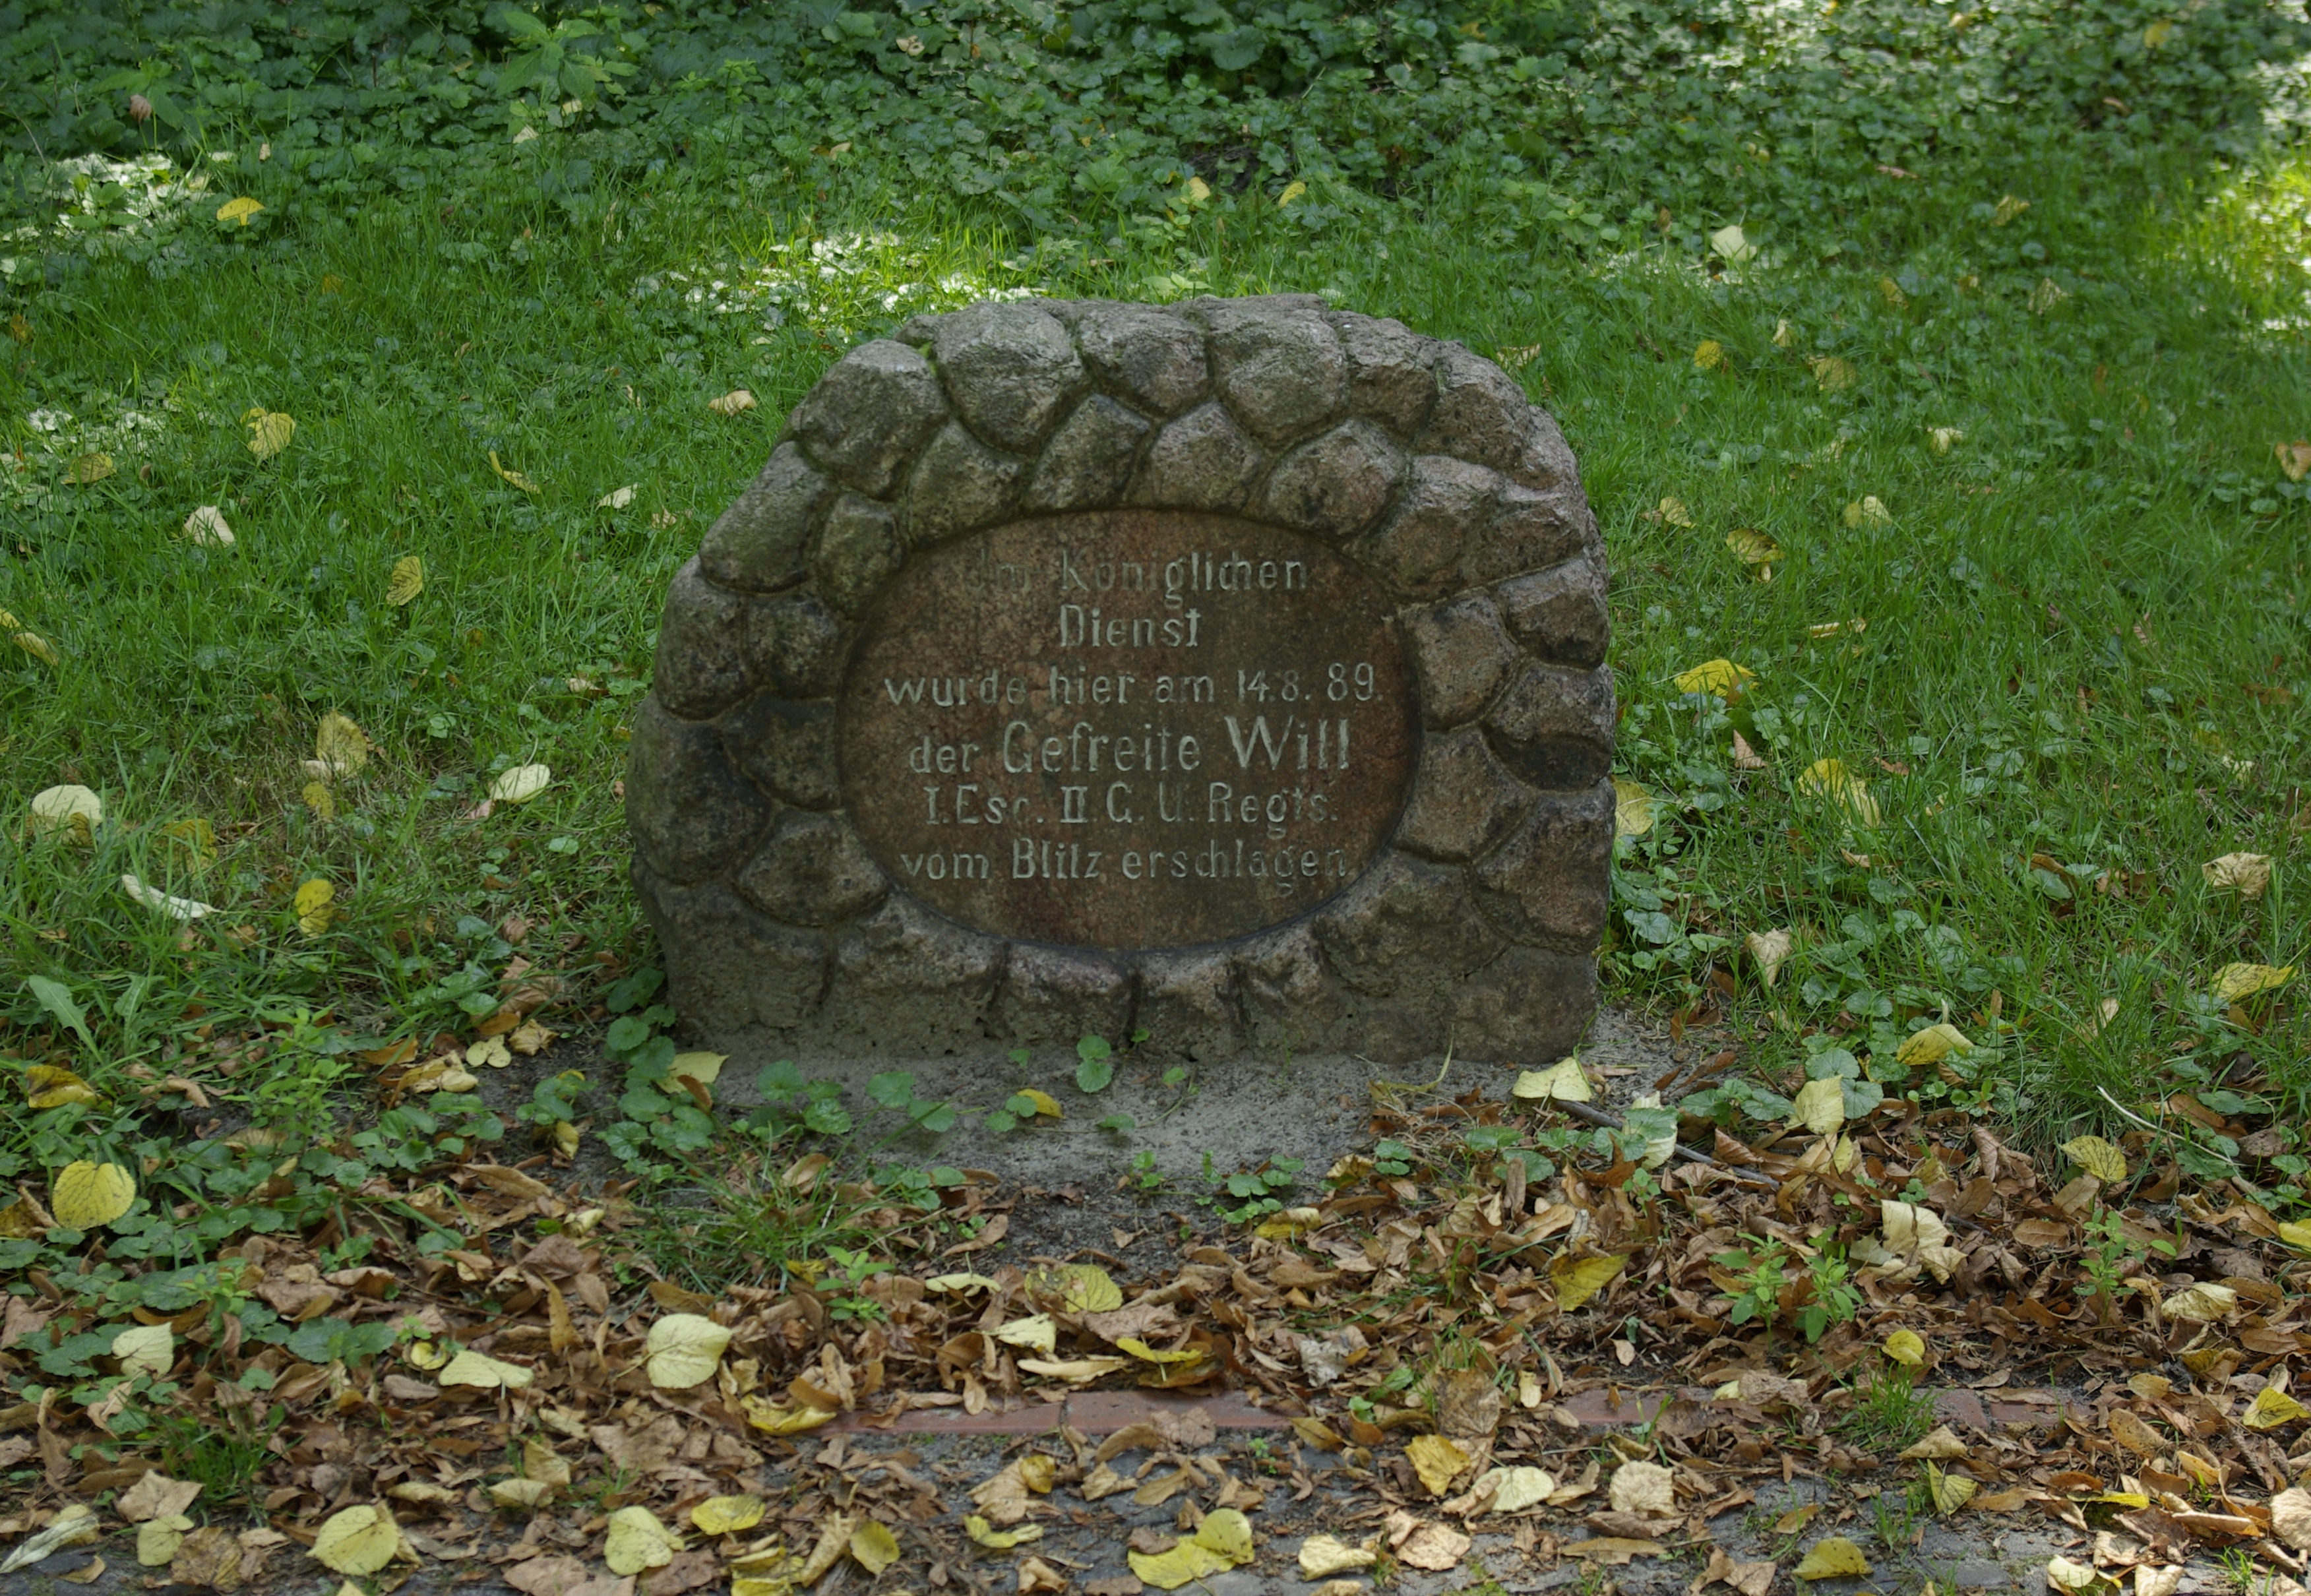 Denkmal Berlin File:berlin-tiergarten Denkmal